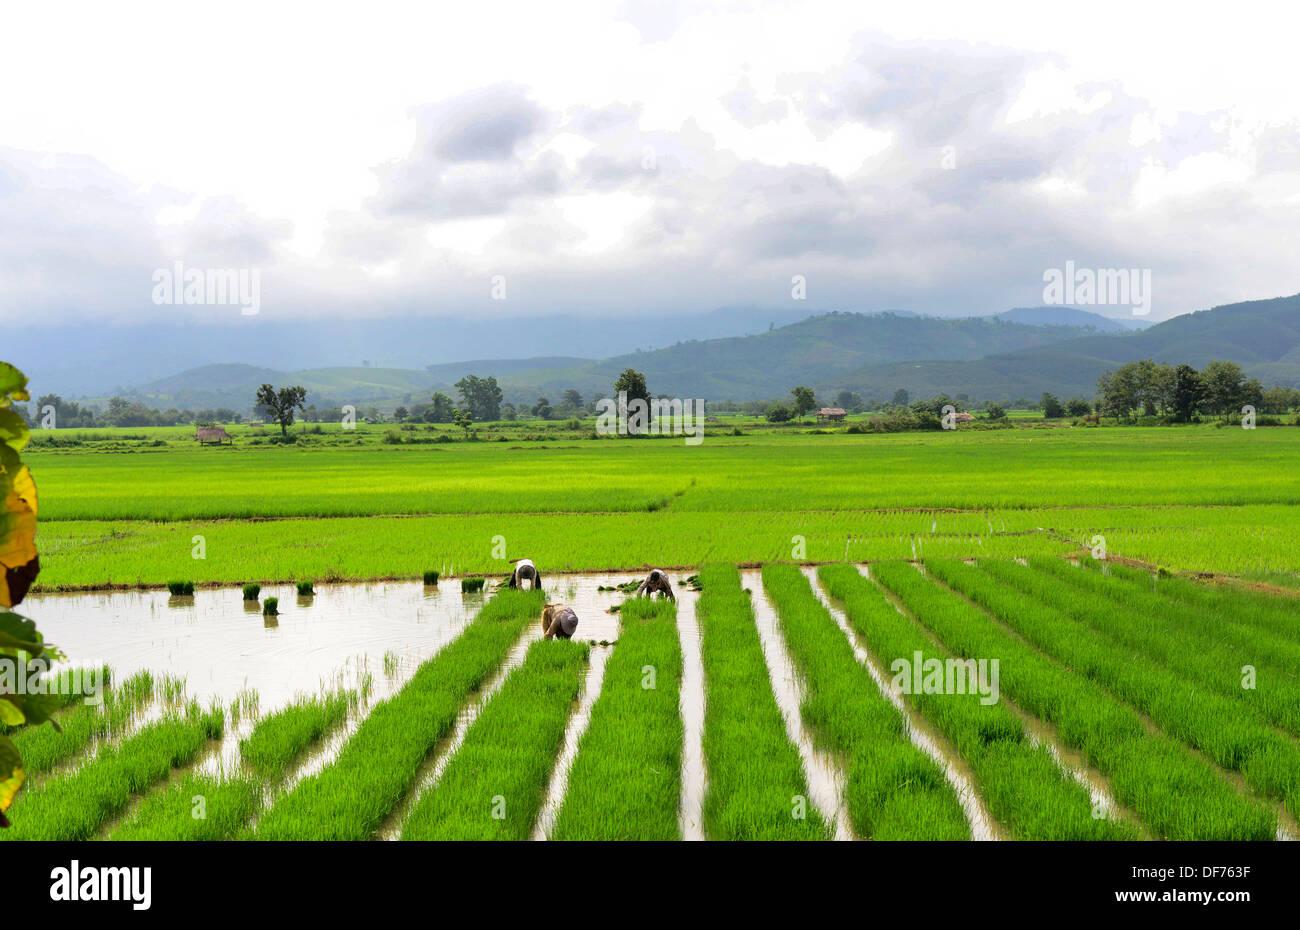 Farmers working in the paddy fields in eastern Myanmar. - Stock Image